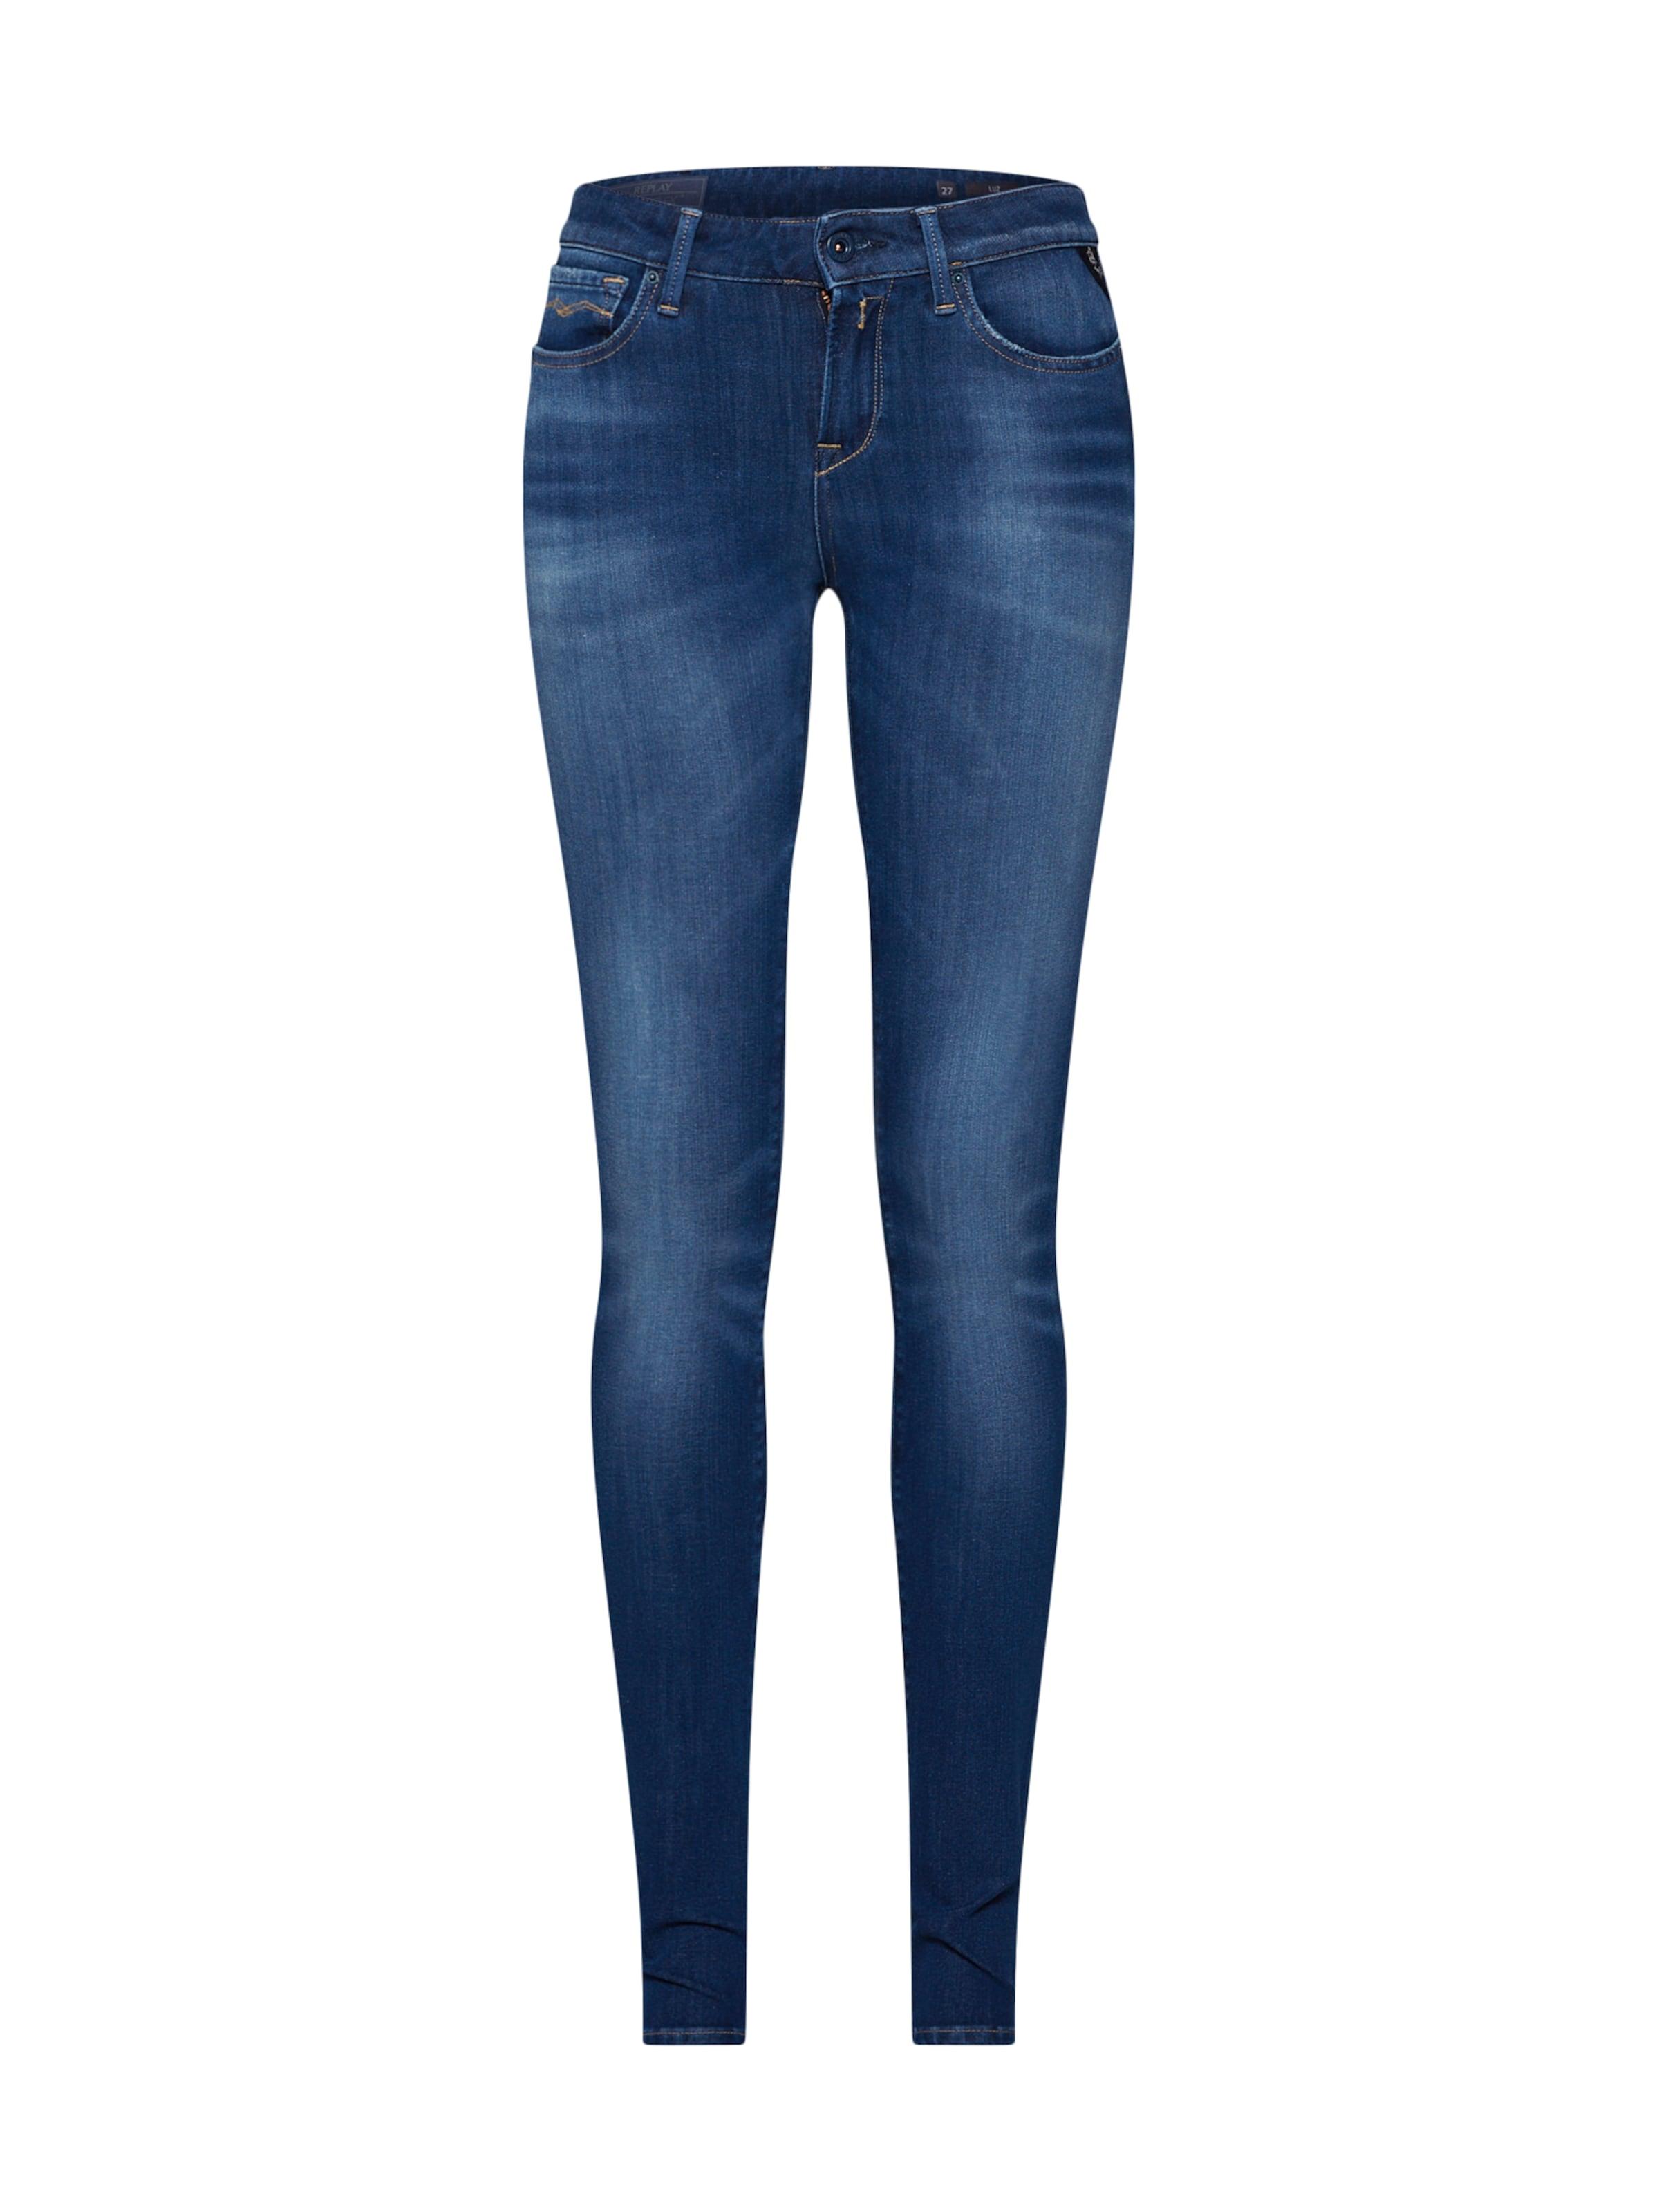 'luz' Jeans Replay Denim In Blue NOX8nw0Pk